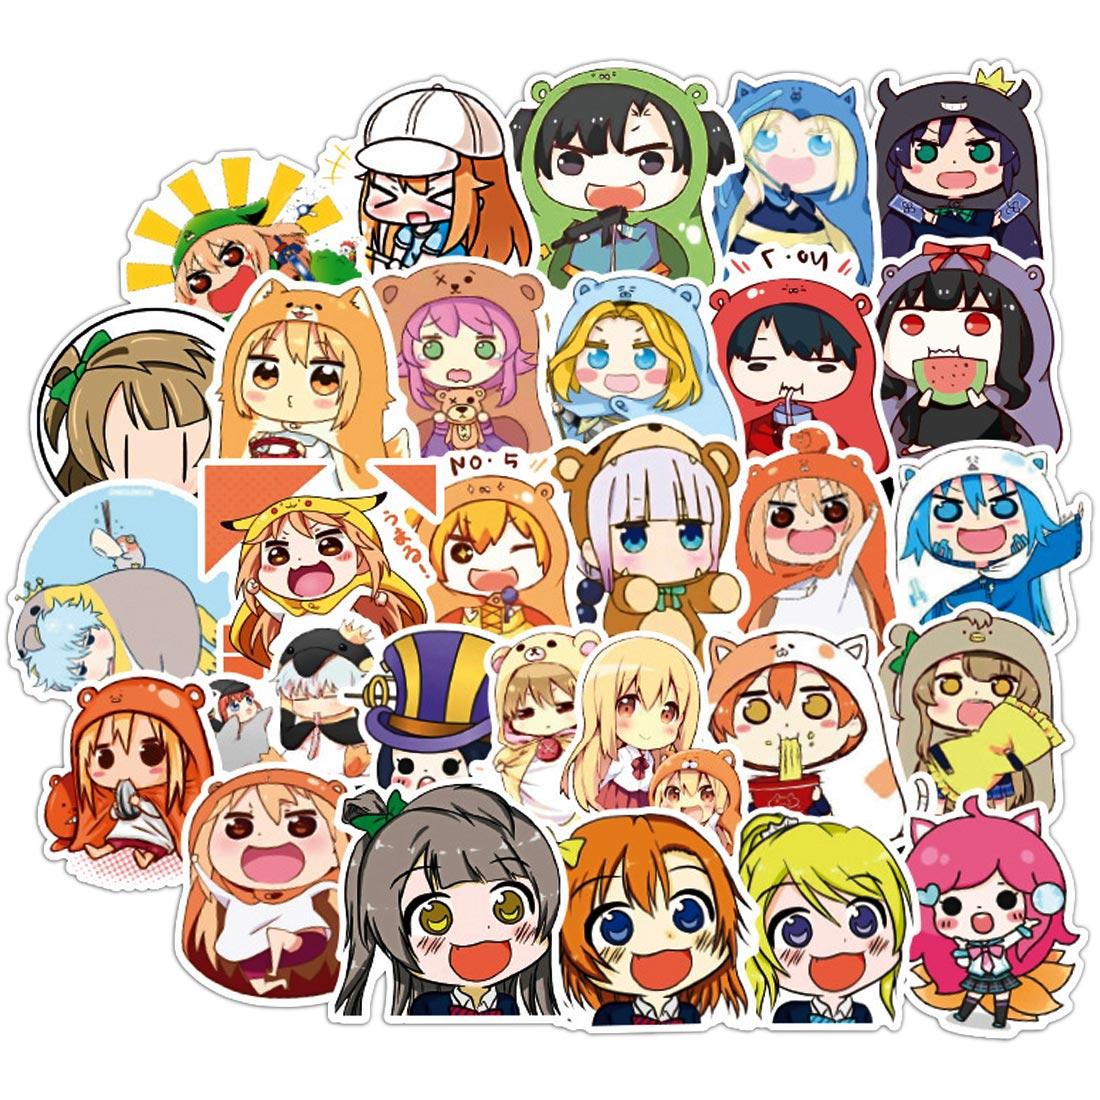 50pcs Himouto Umaru Chan Anime Kawaii Lazy Otaku Cute Girl Scrapbooking Phone Laptop Car Stickers Pack for Bike Cartoon Sticker